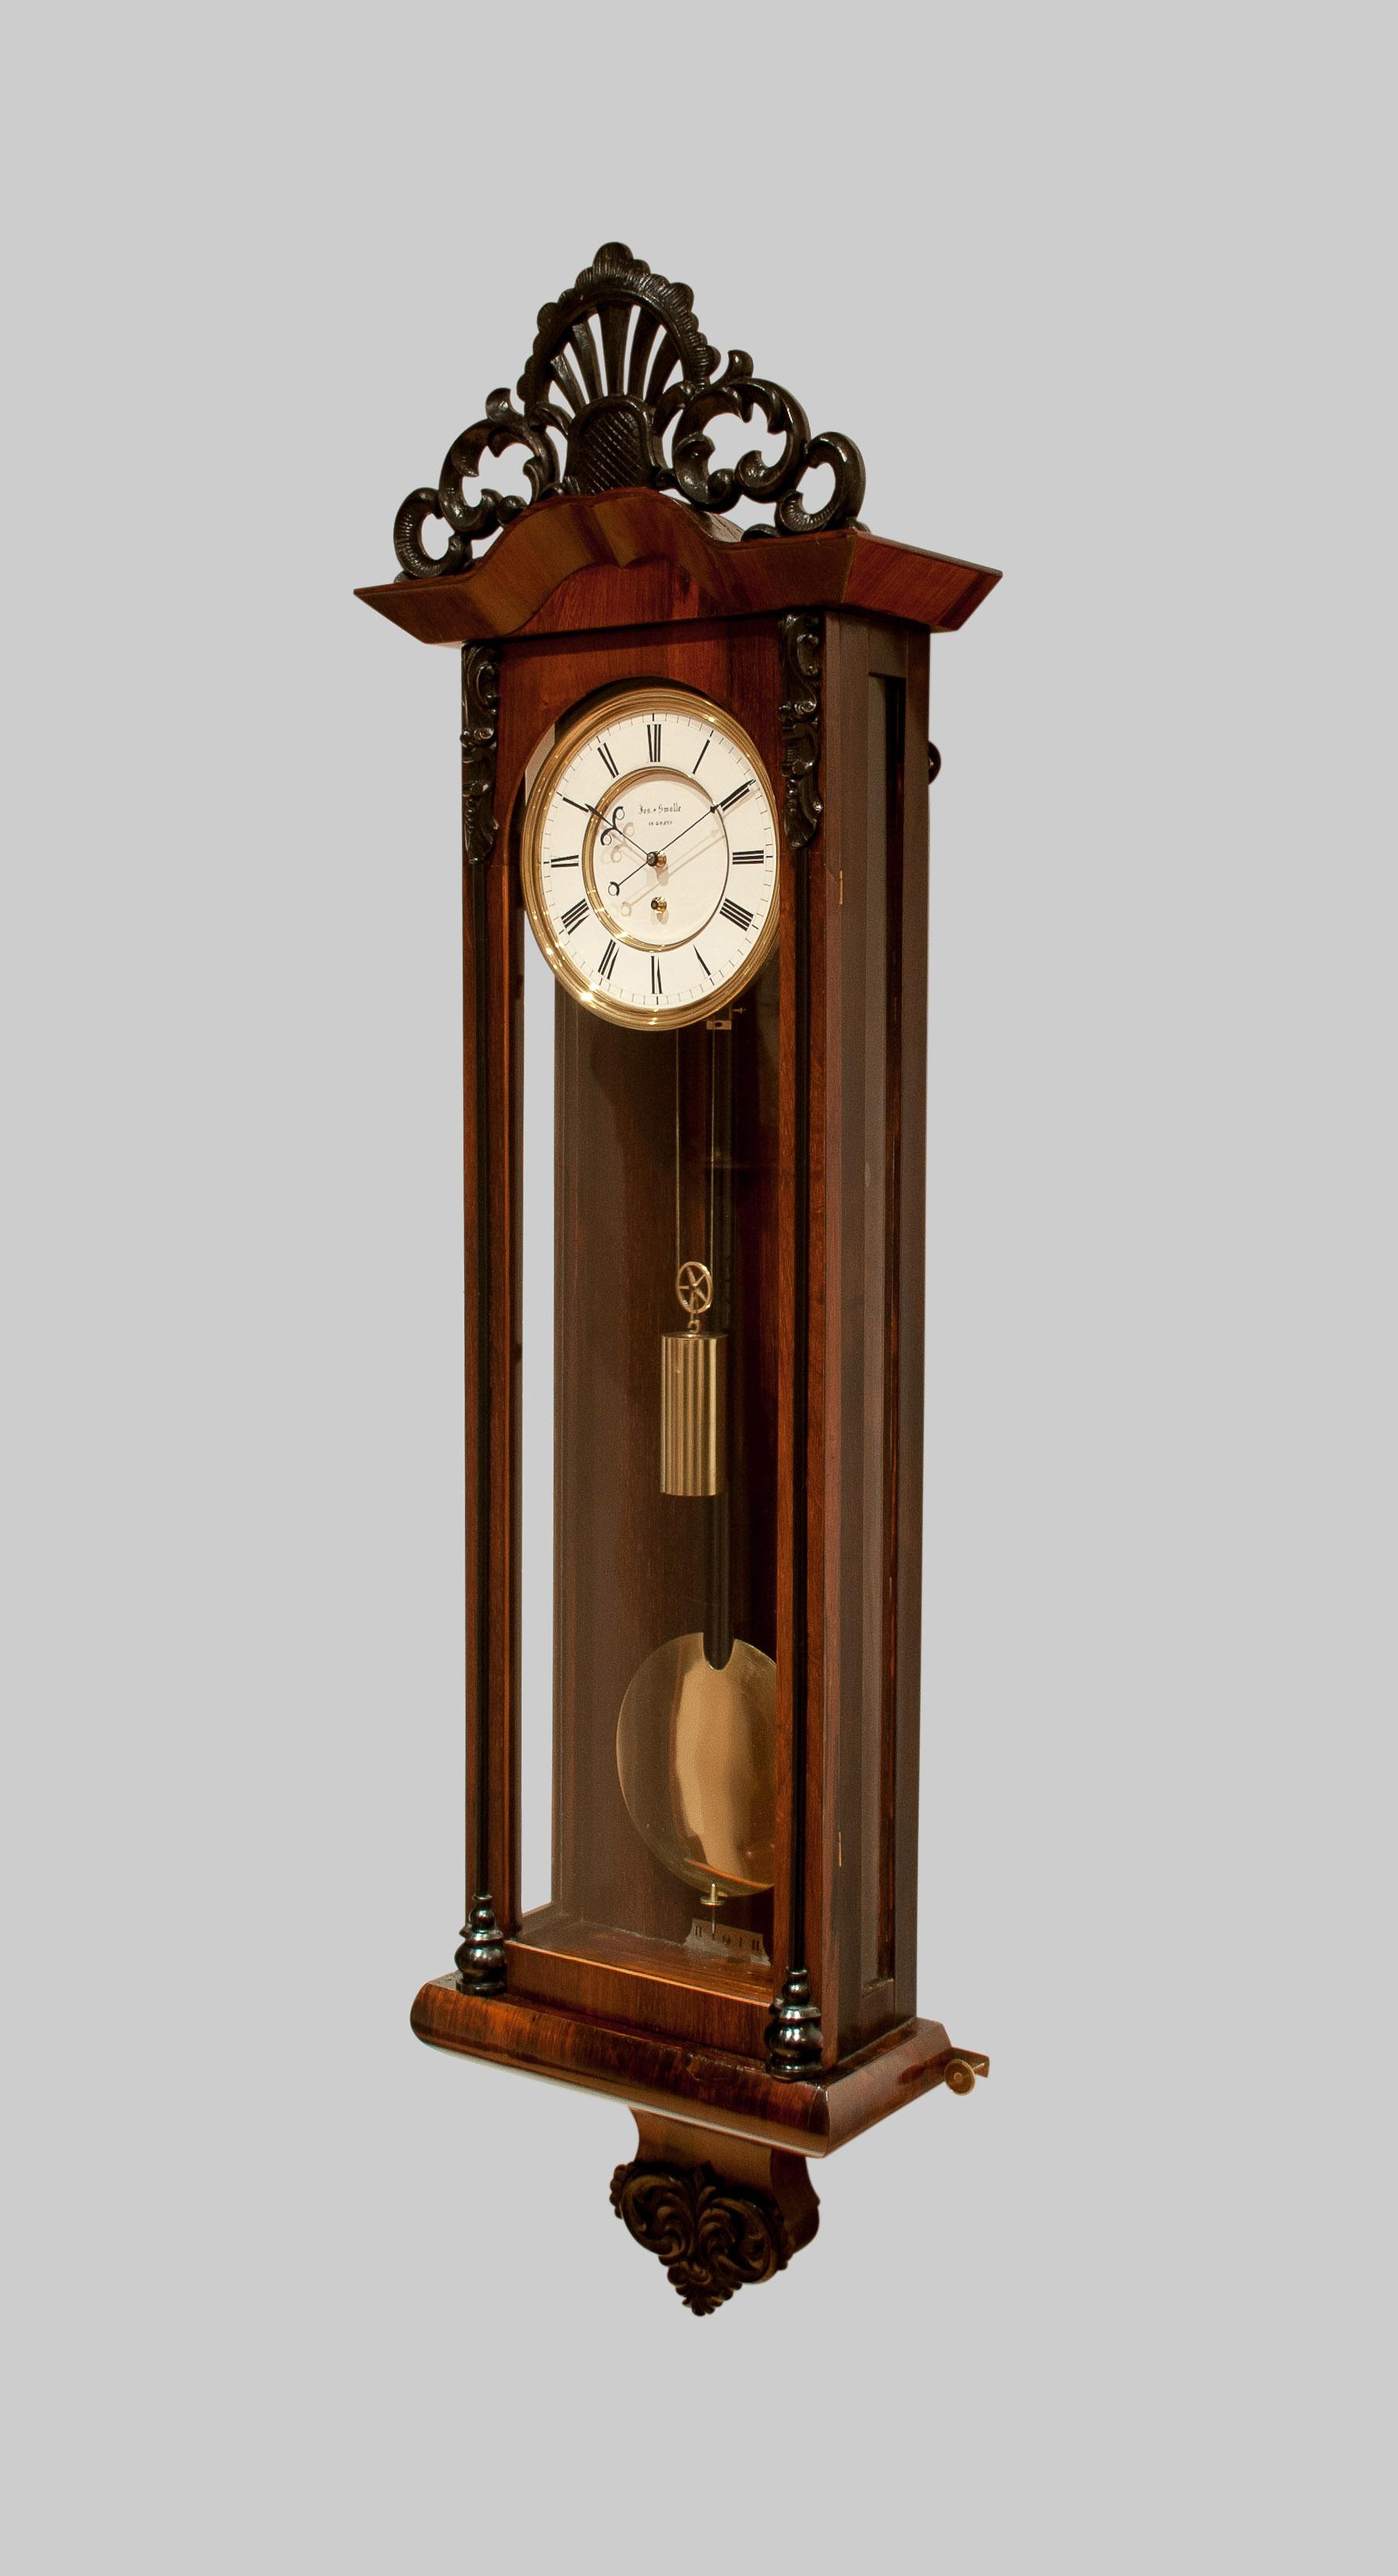 Antique Wall Clocks Vienna Regulator Clocks Vienna